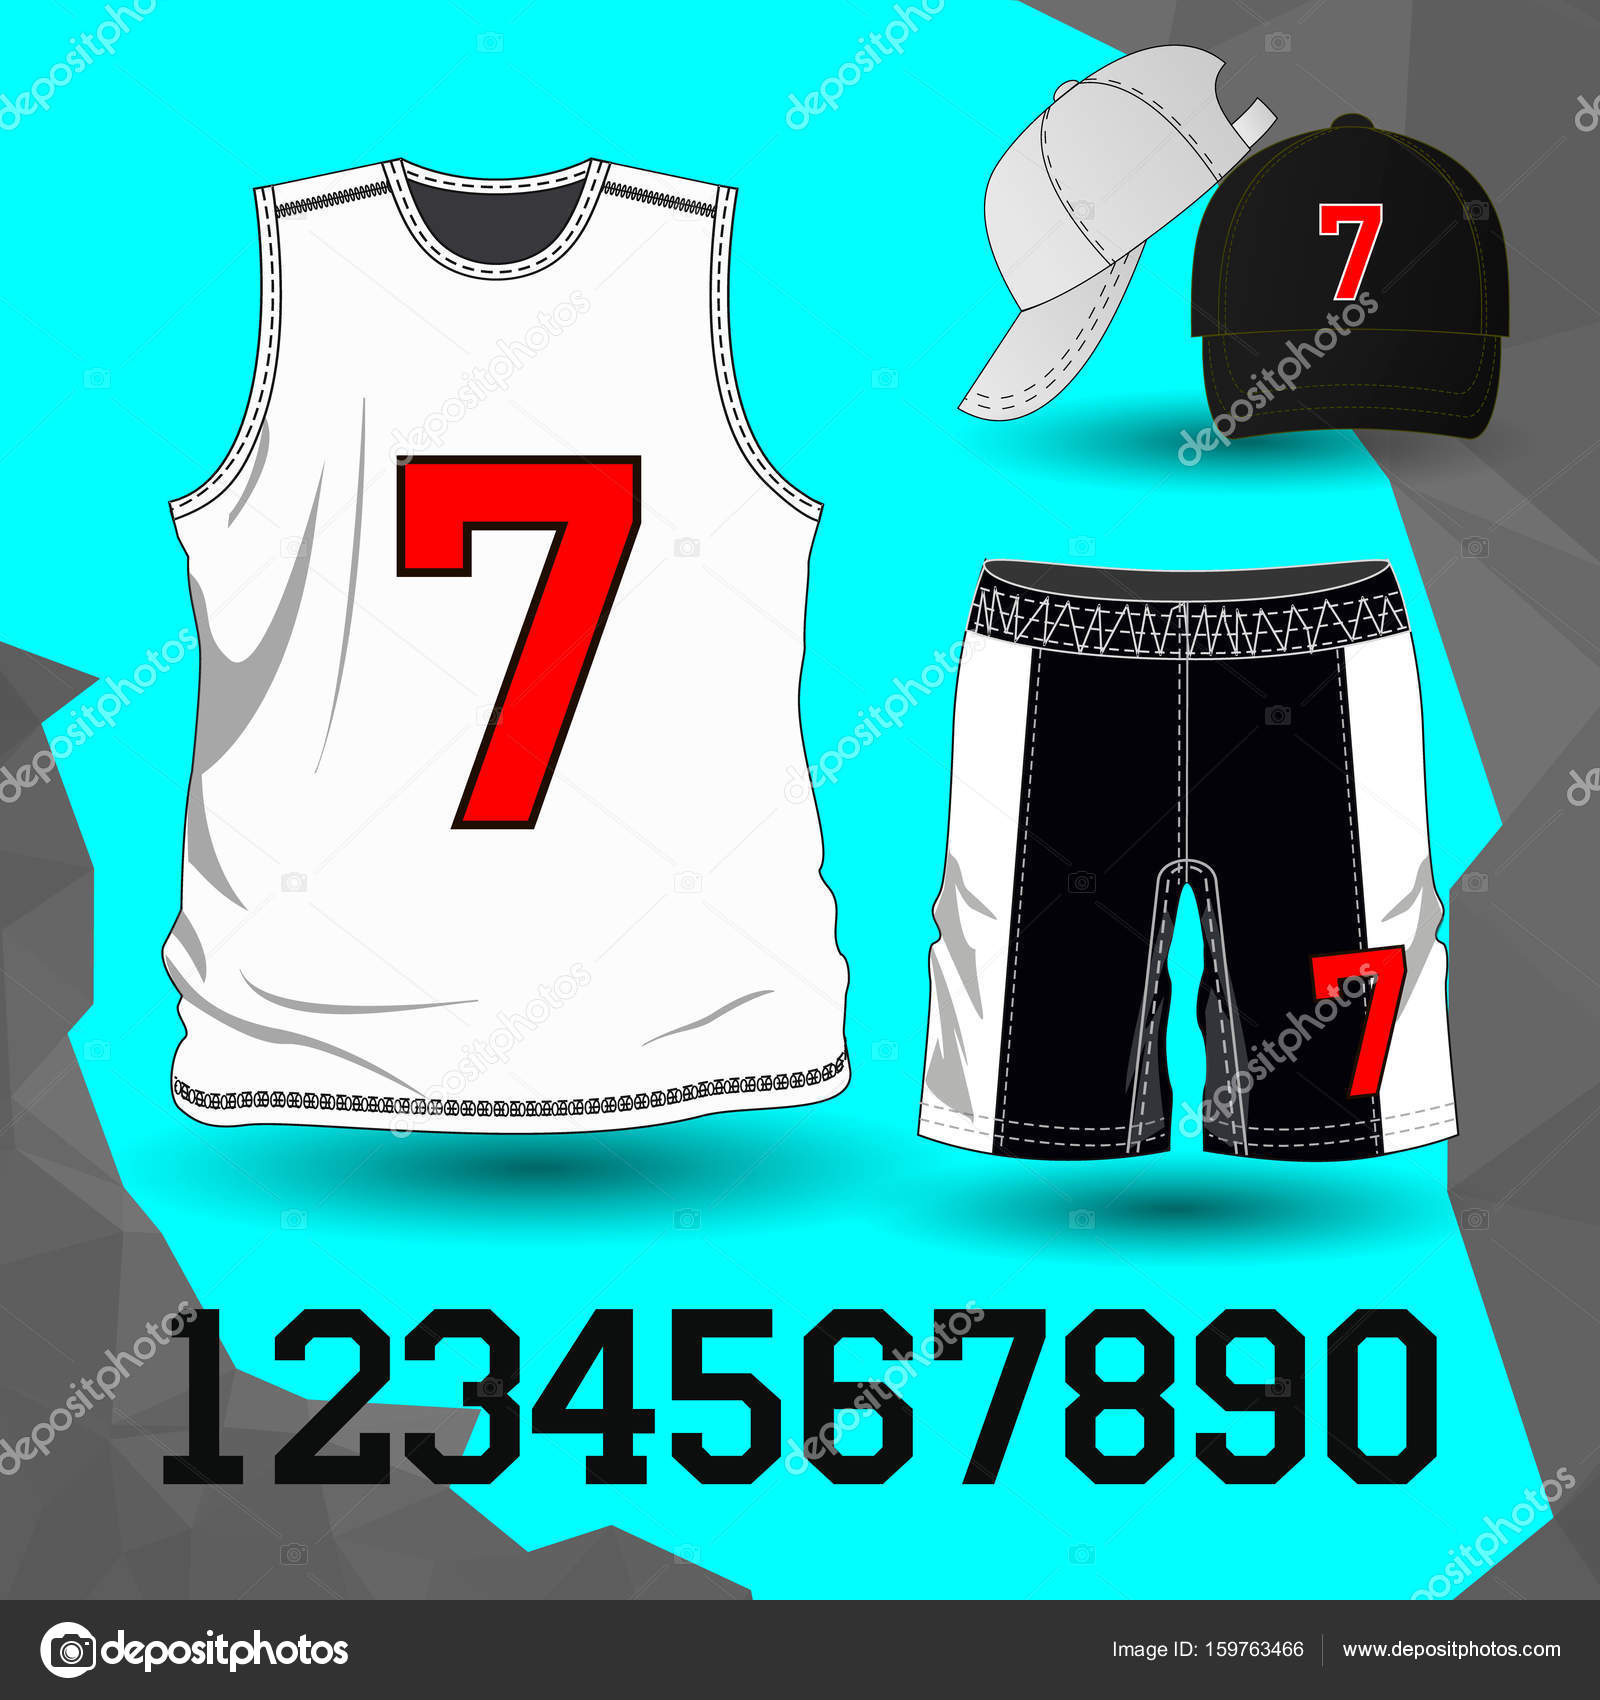 b3d7b744b3d6b Fútbol de uniforme  camiseta